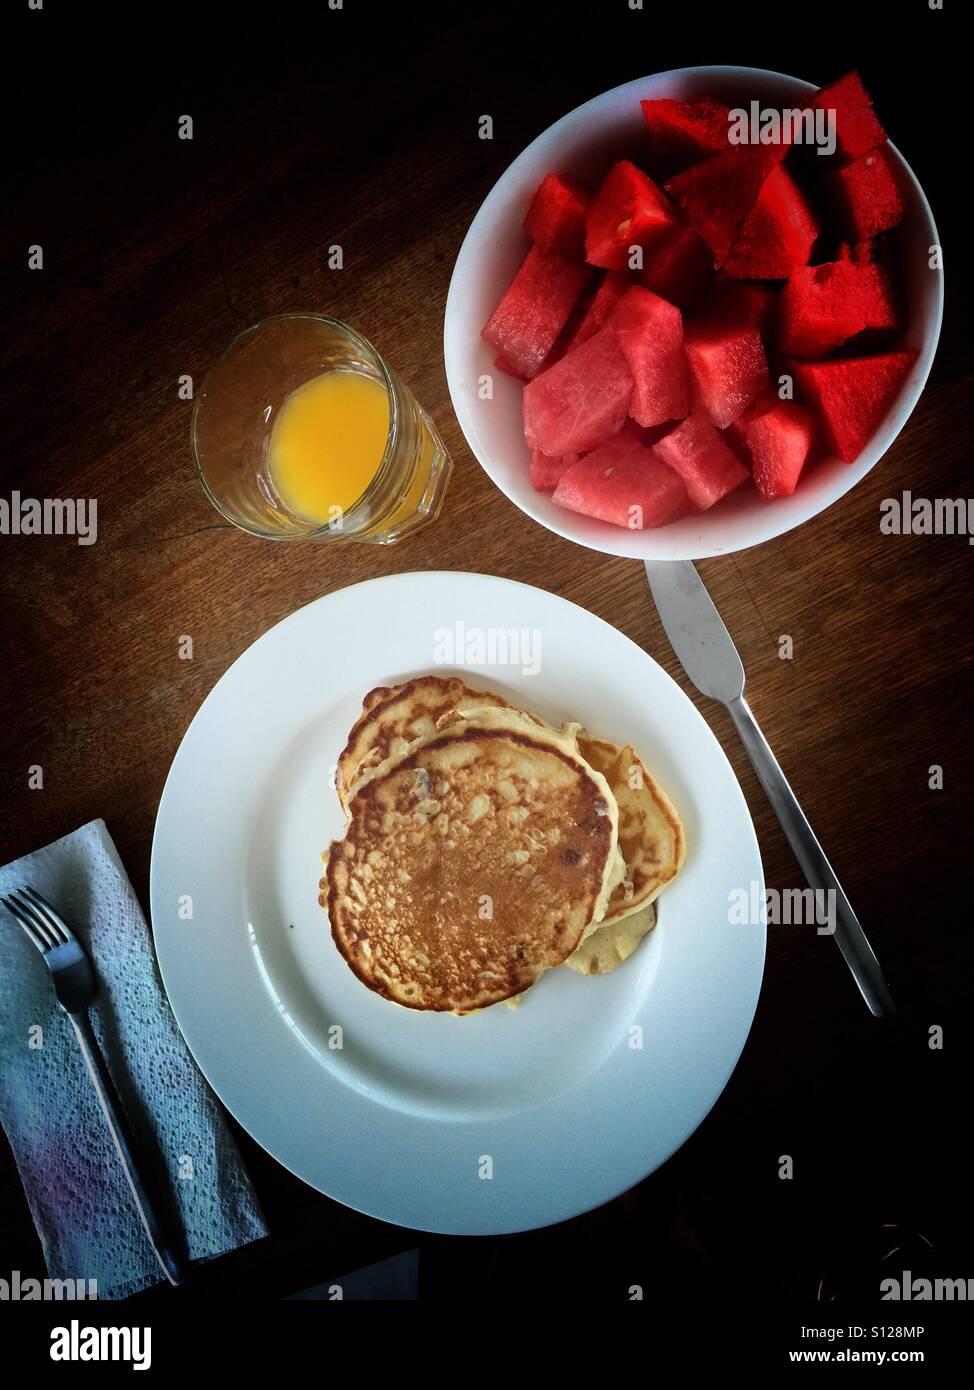 Pancakes, watermelon, and orange juice - Stock Image